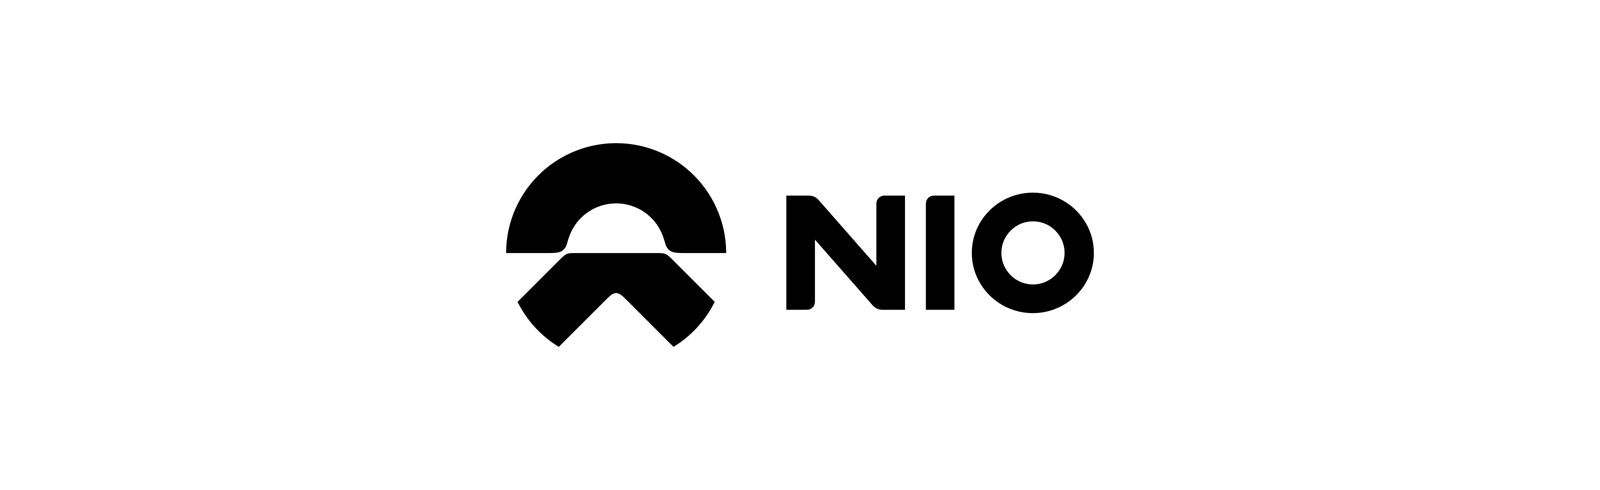 NIO deliveries for October 2020 show a 100.1% YoY increase